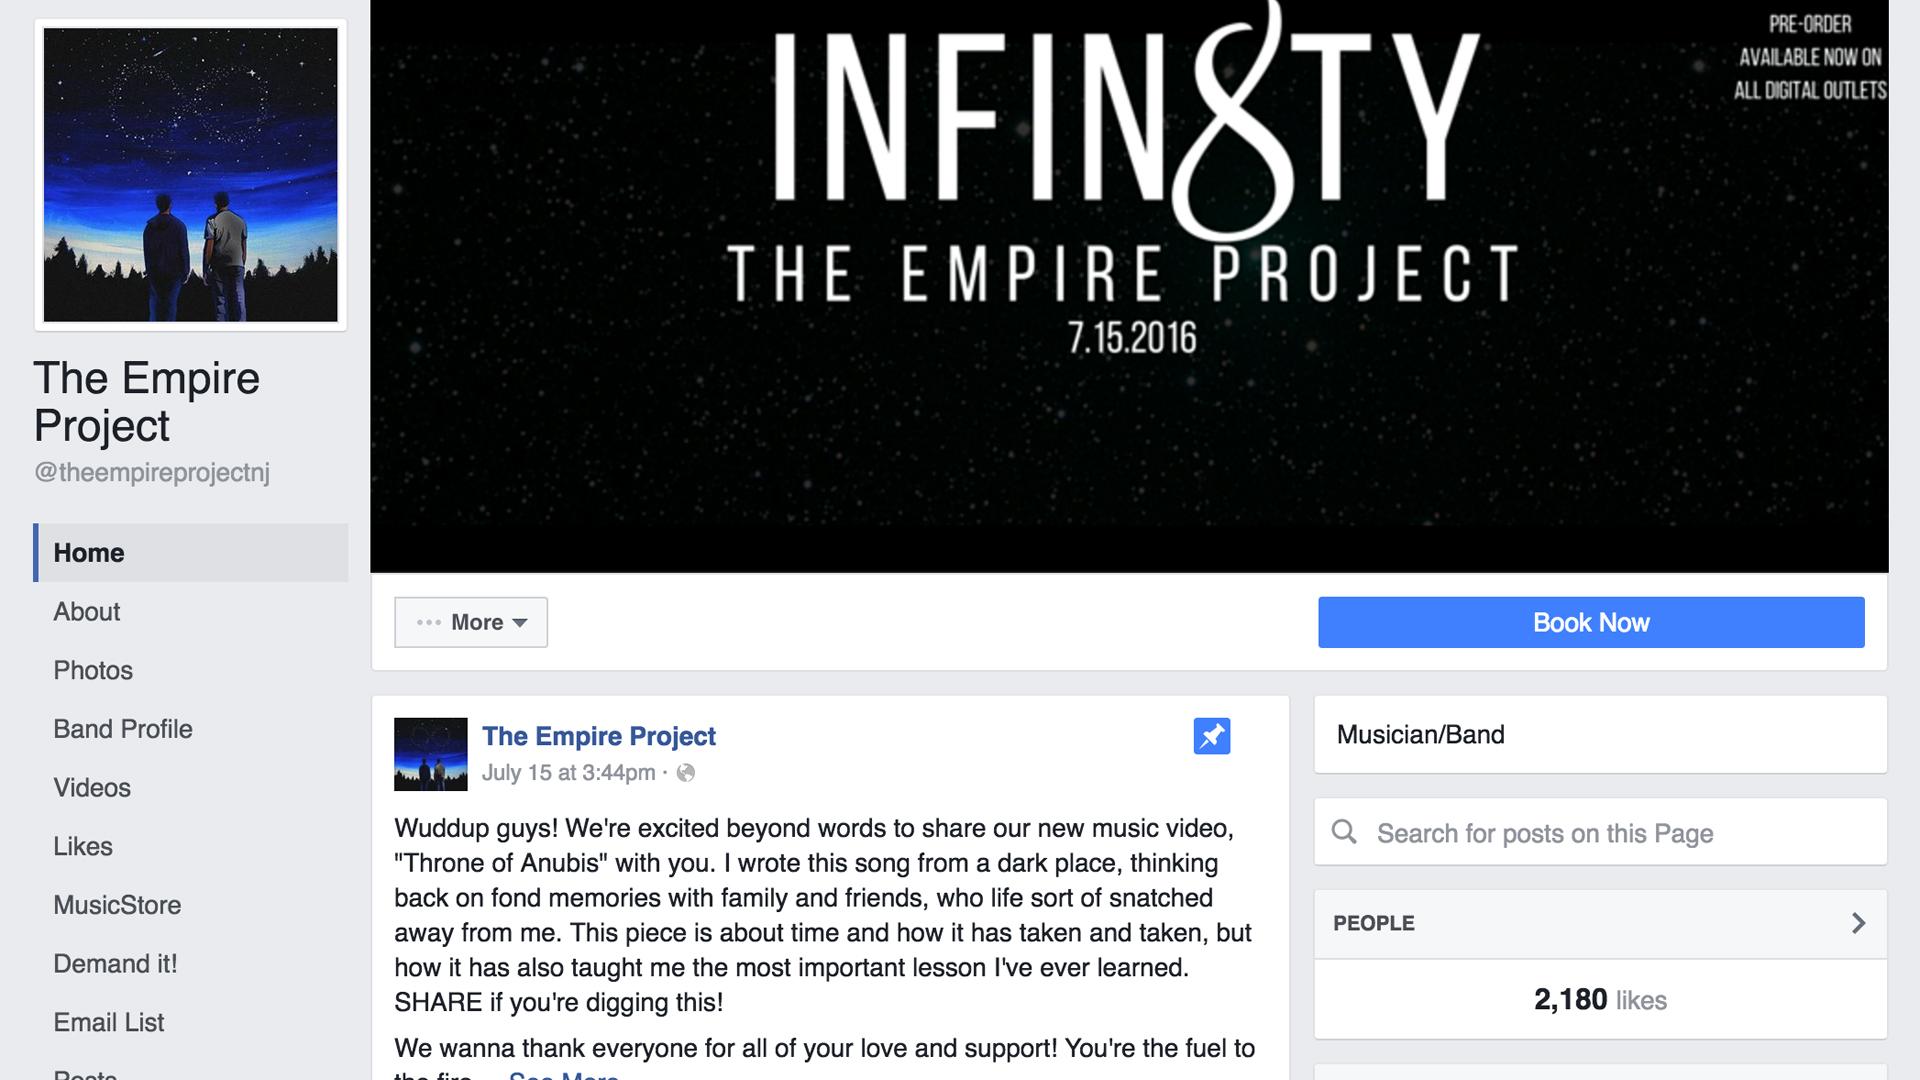 facebook.com/theempireprojectnj